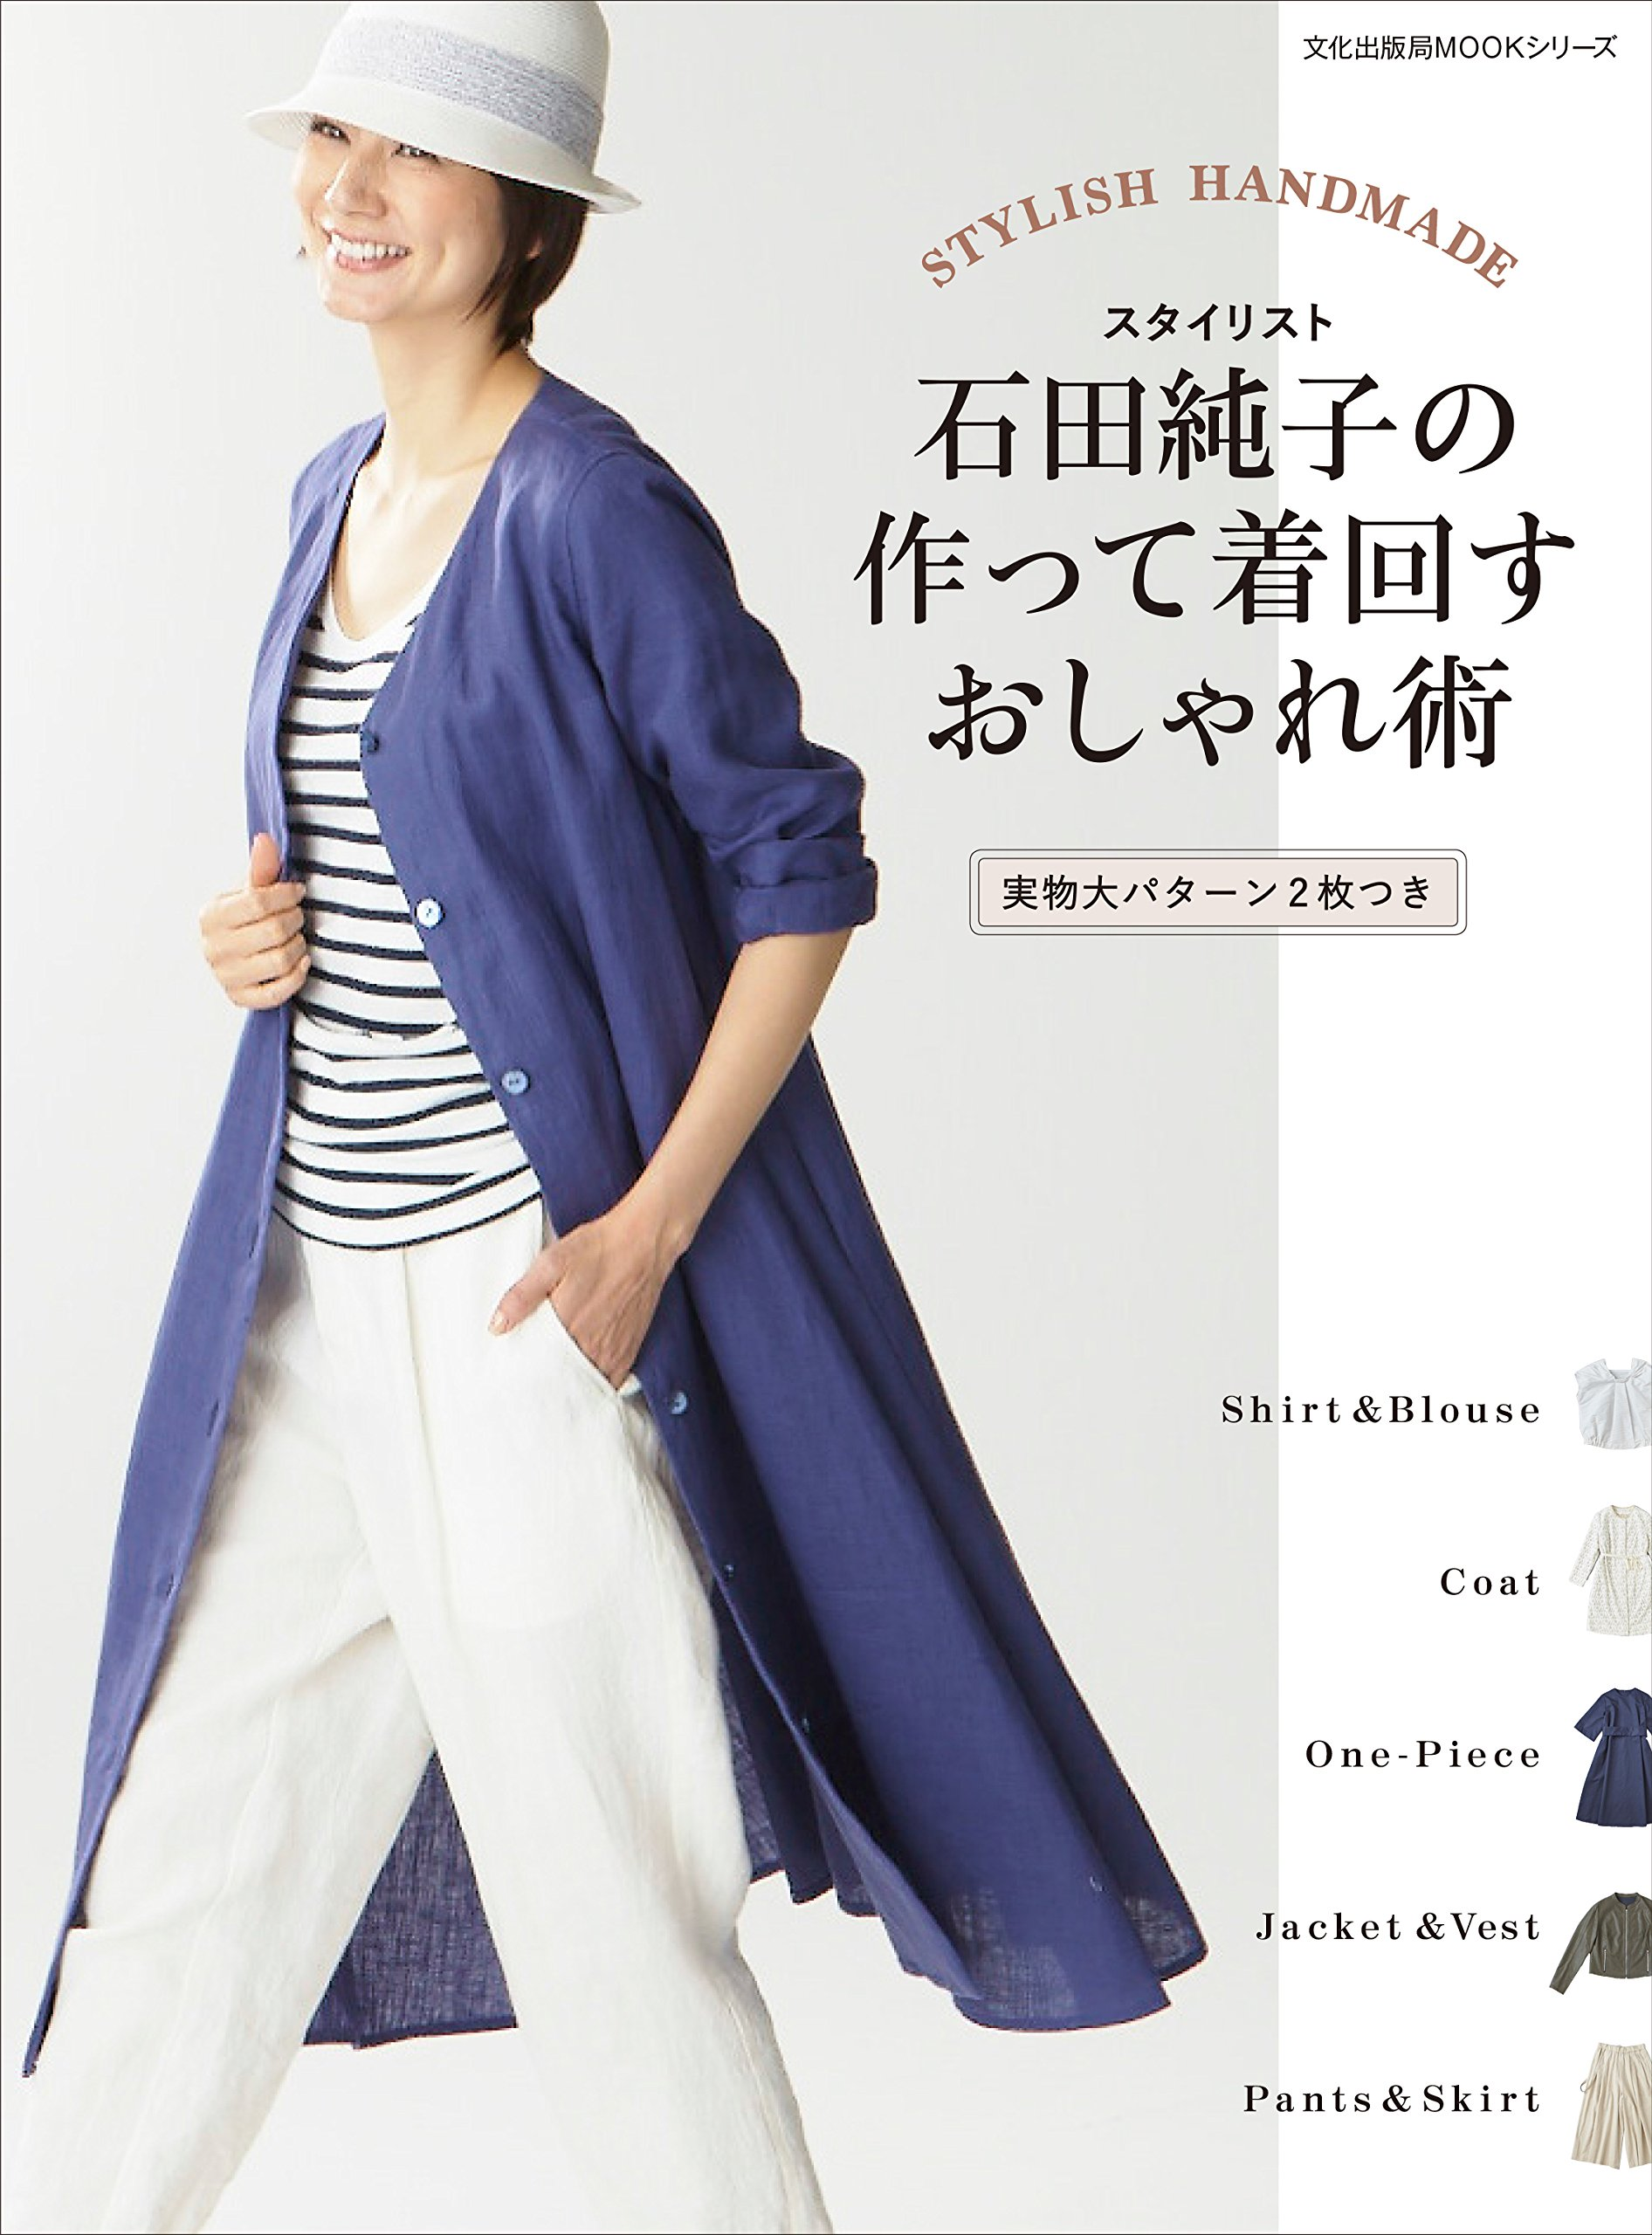 Fashionable fusion stylist by Junko Ishida